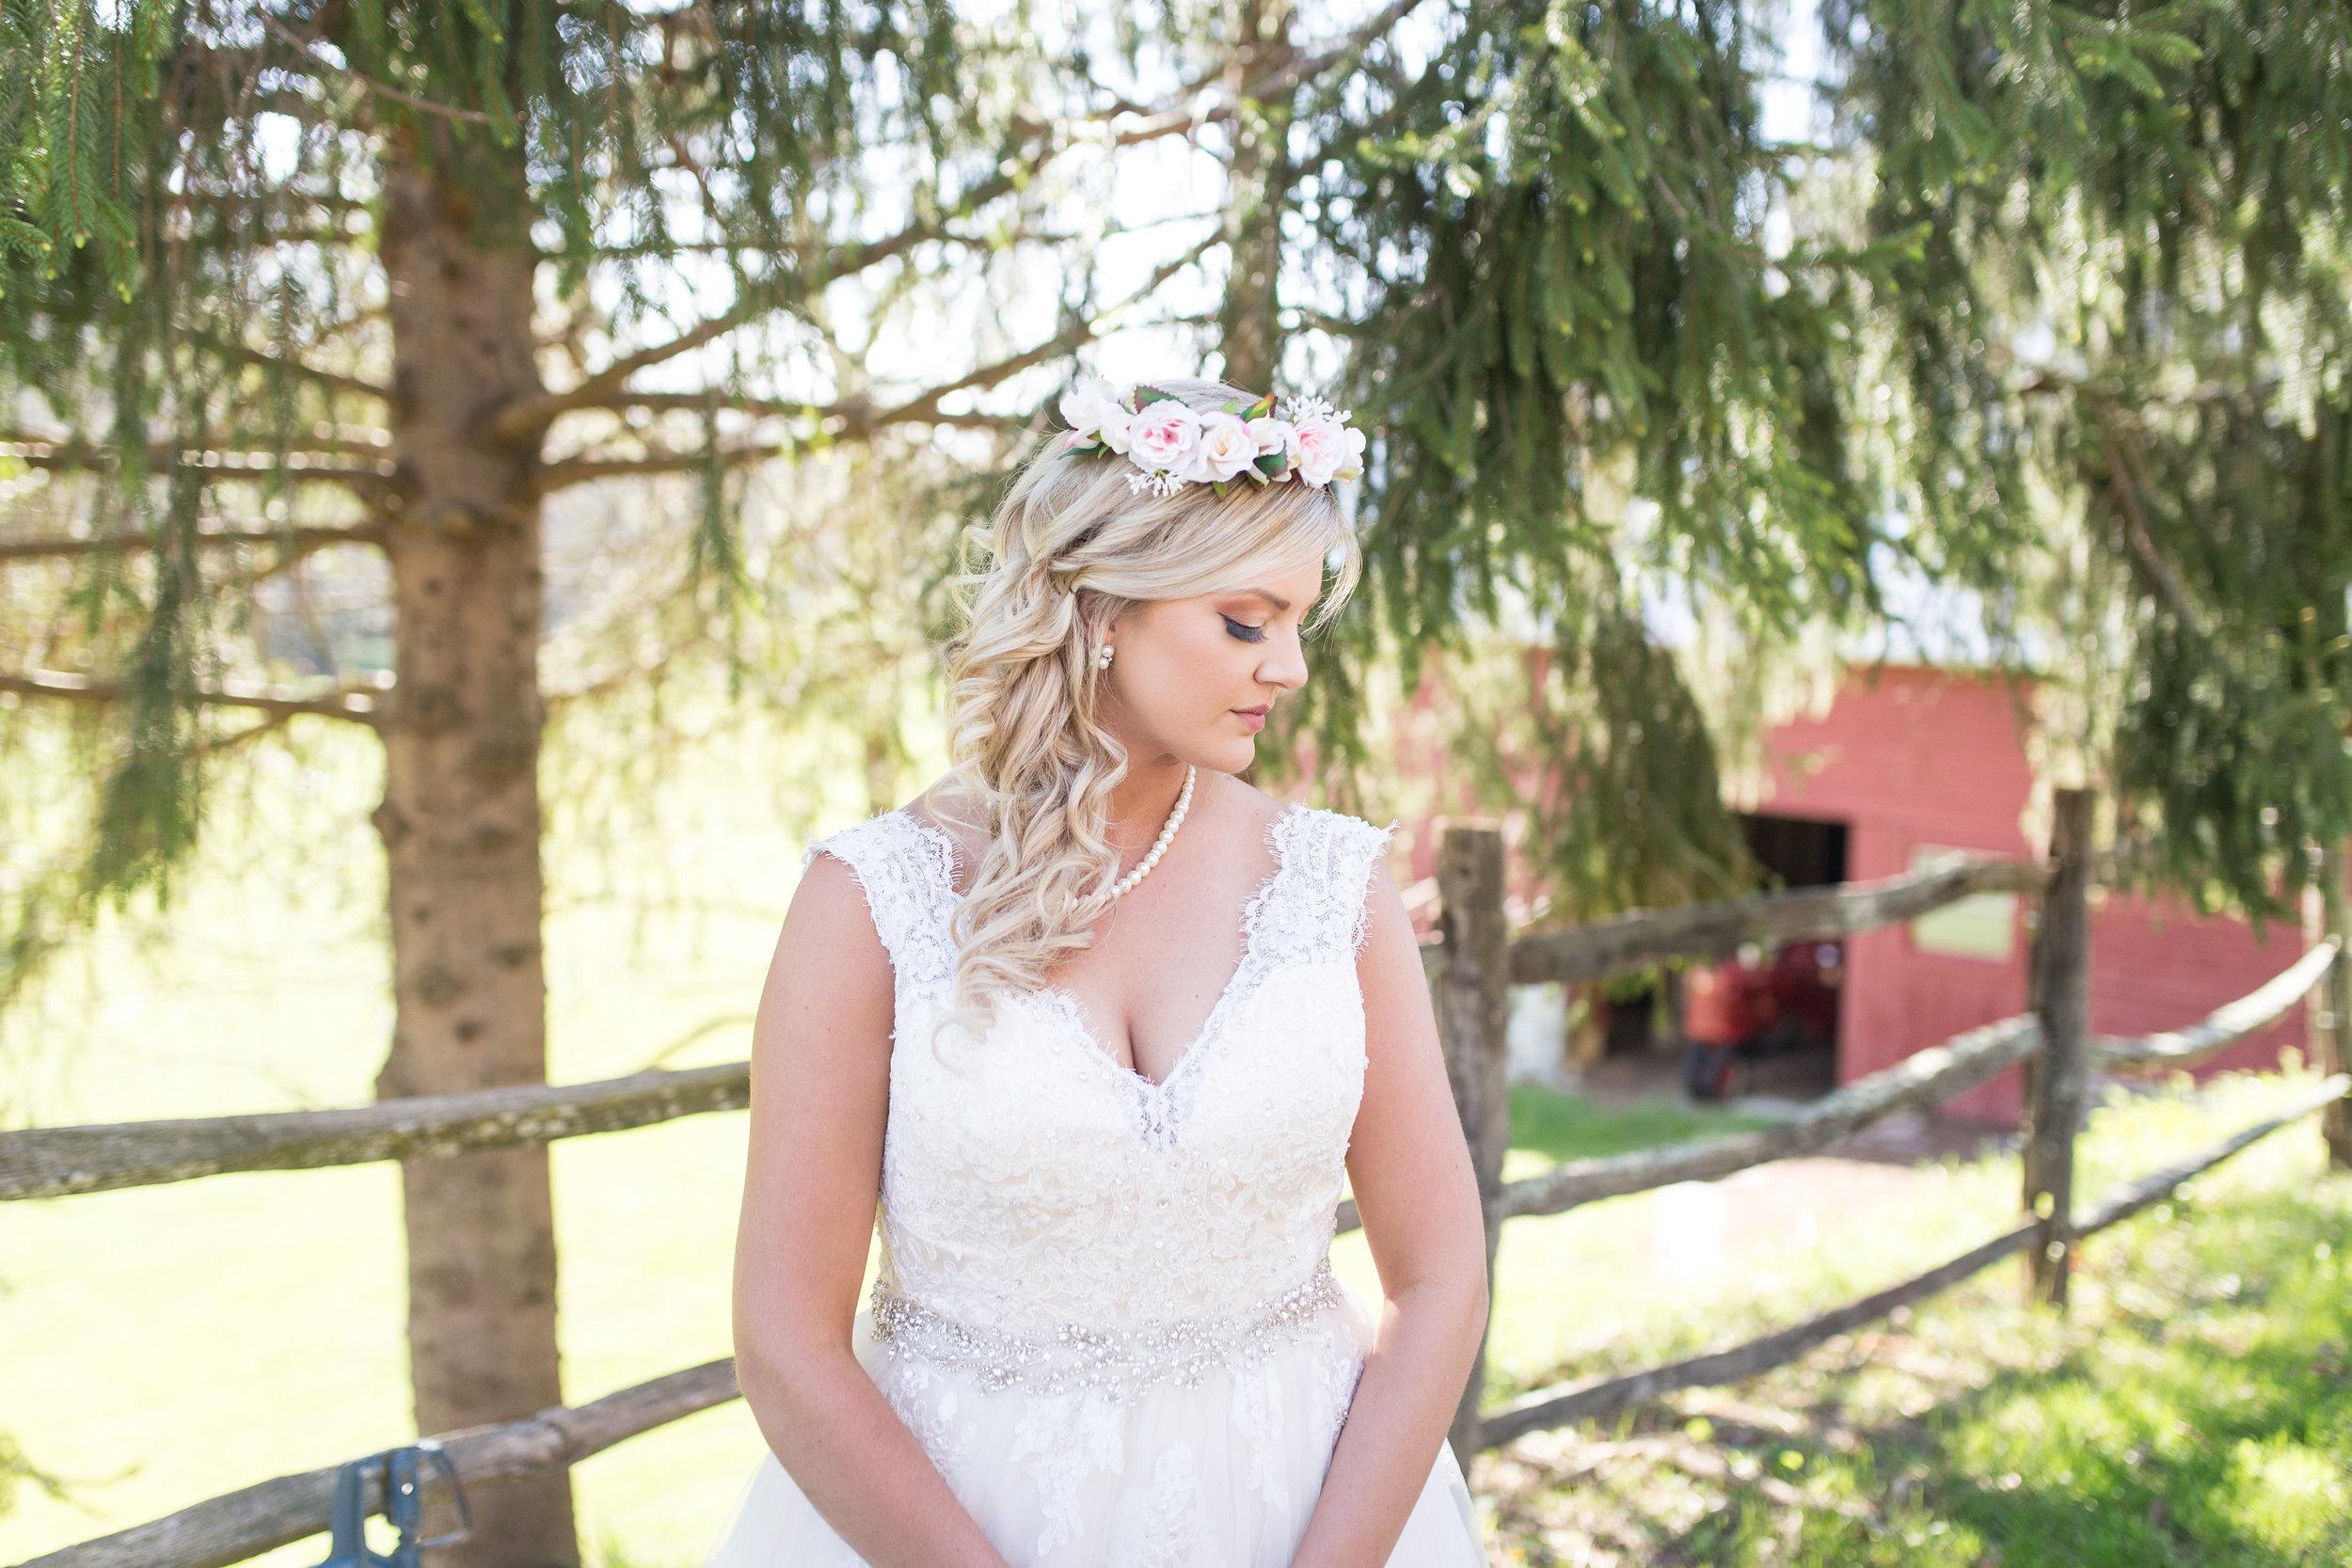 Honeysuckle-Hill-Asheville-Wedding-Venue-Ann-Cordell-Bridal-42.JPG